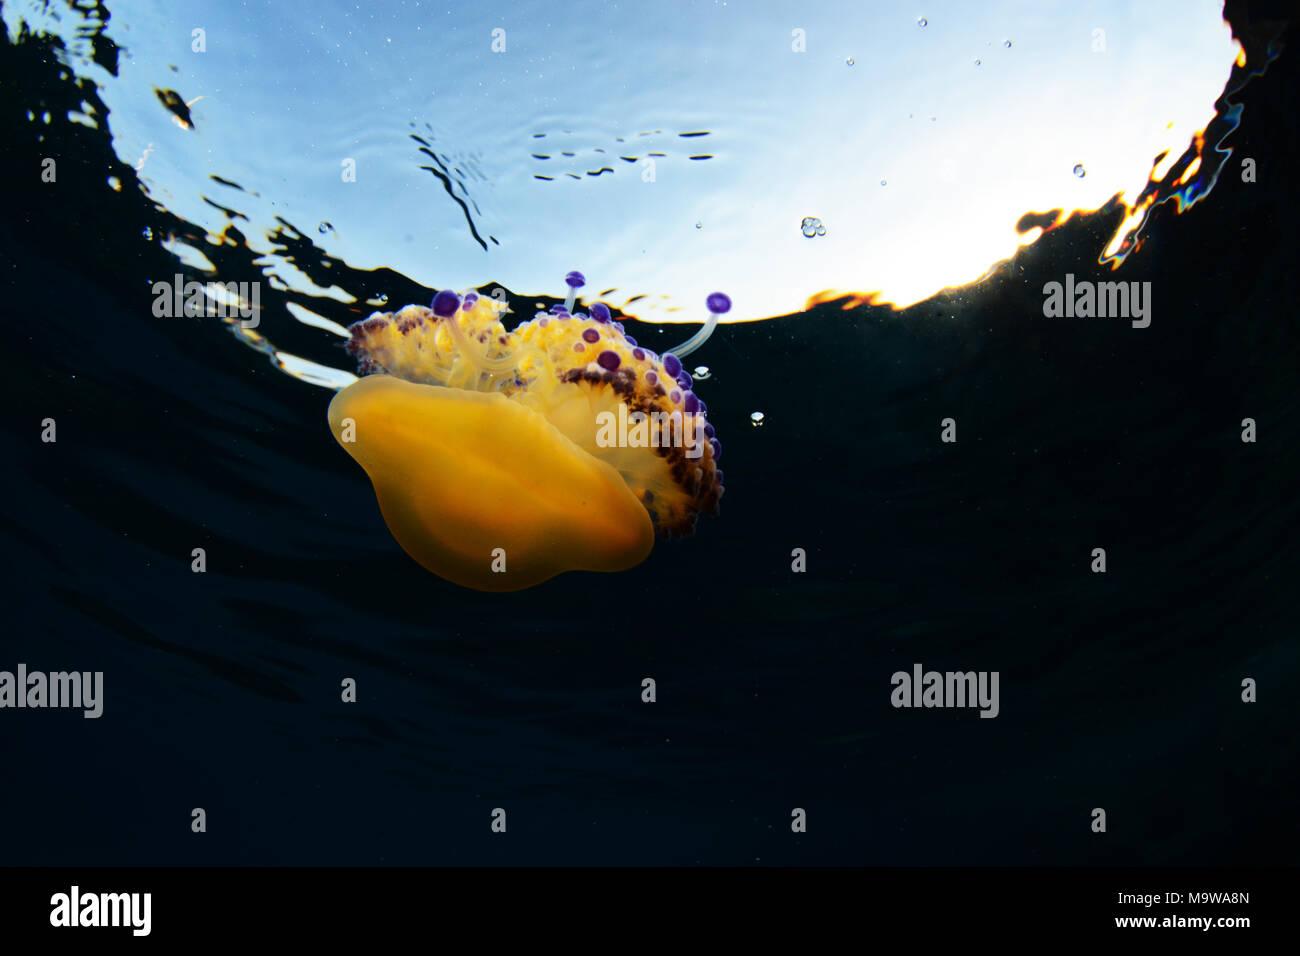 Mediterranean jelly or fried egg jellyfish at Cala Blanca, Menorca - Stock Image